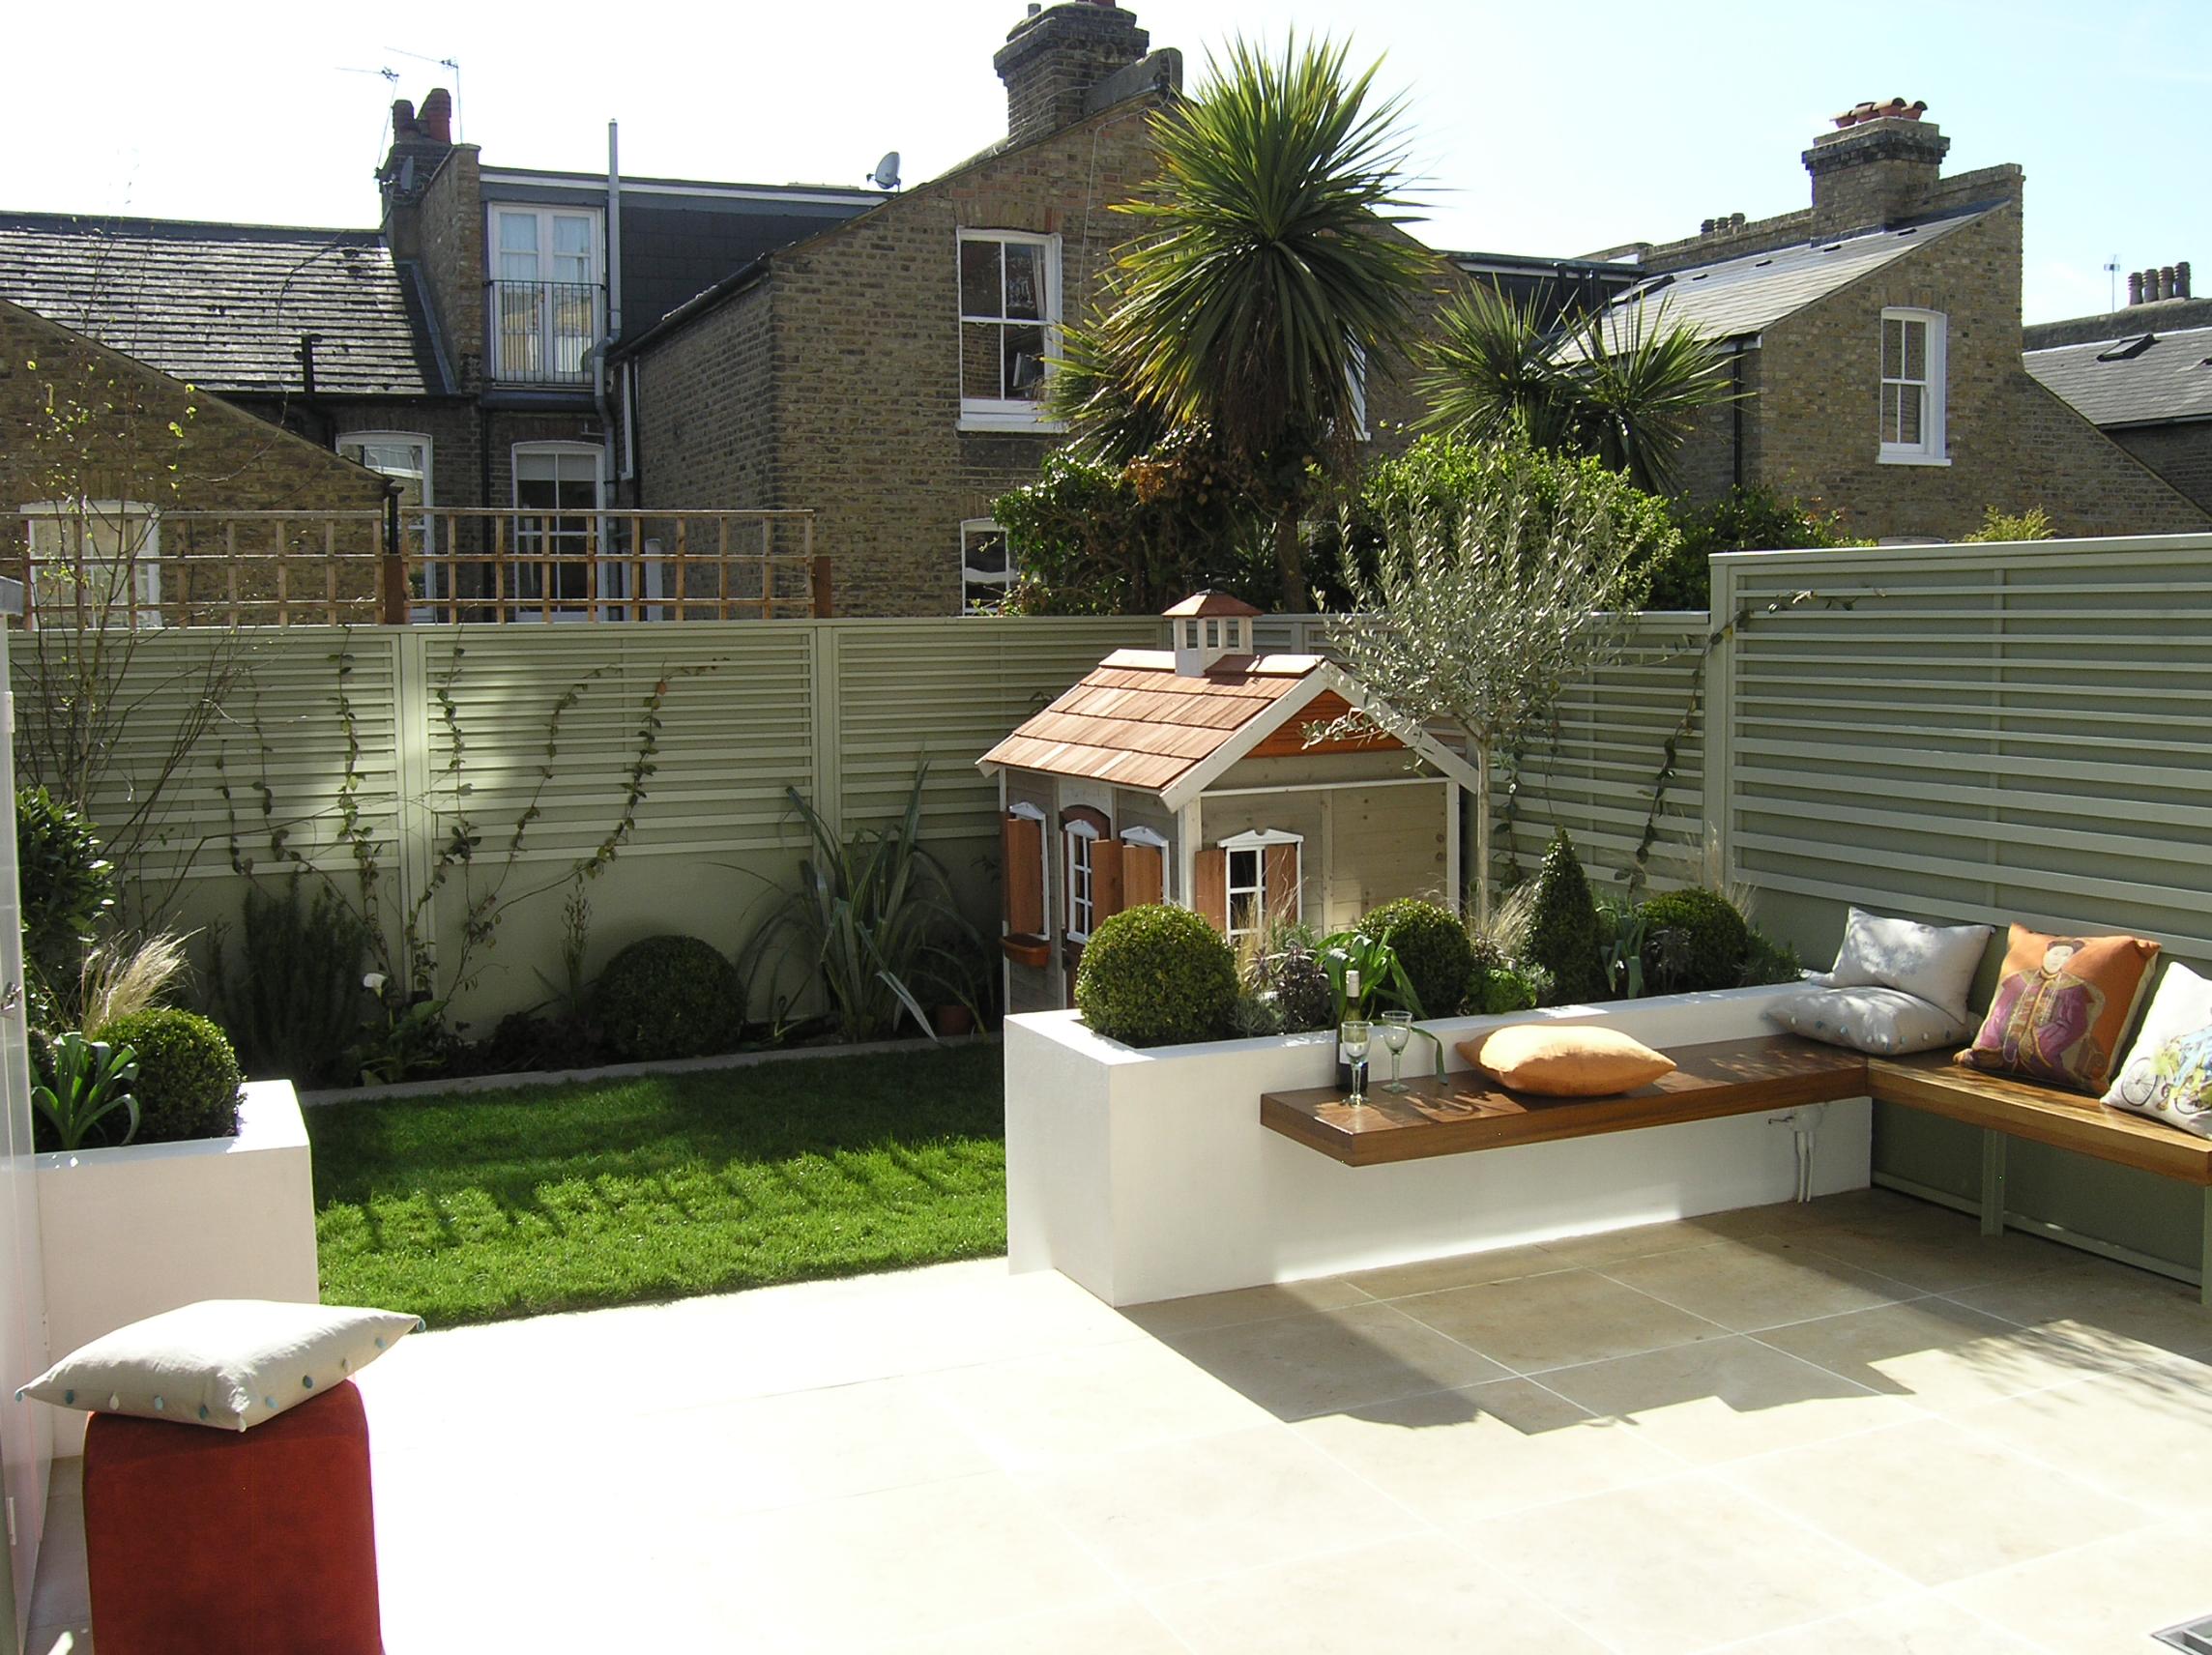 Small courtyard garden inspiration  FPg  Hage  Pinterest  Gardens Garden ideas and Backyard